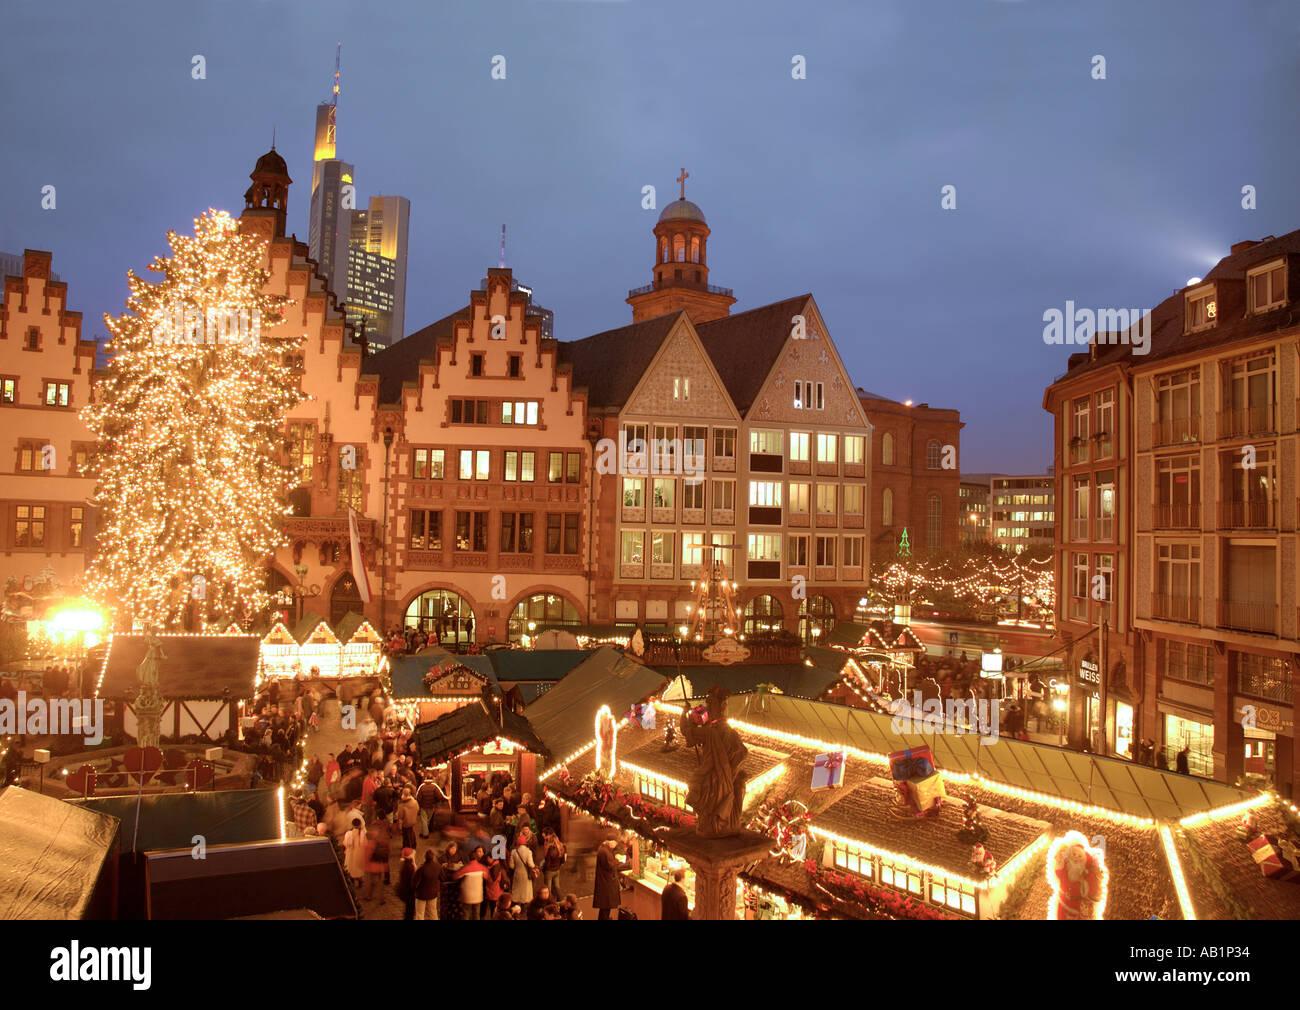 Weihnachtsmarkt Frankfurt Main.Germany Hesse Hessen Frankfurt Am Main Romerberg Christmas Markets